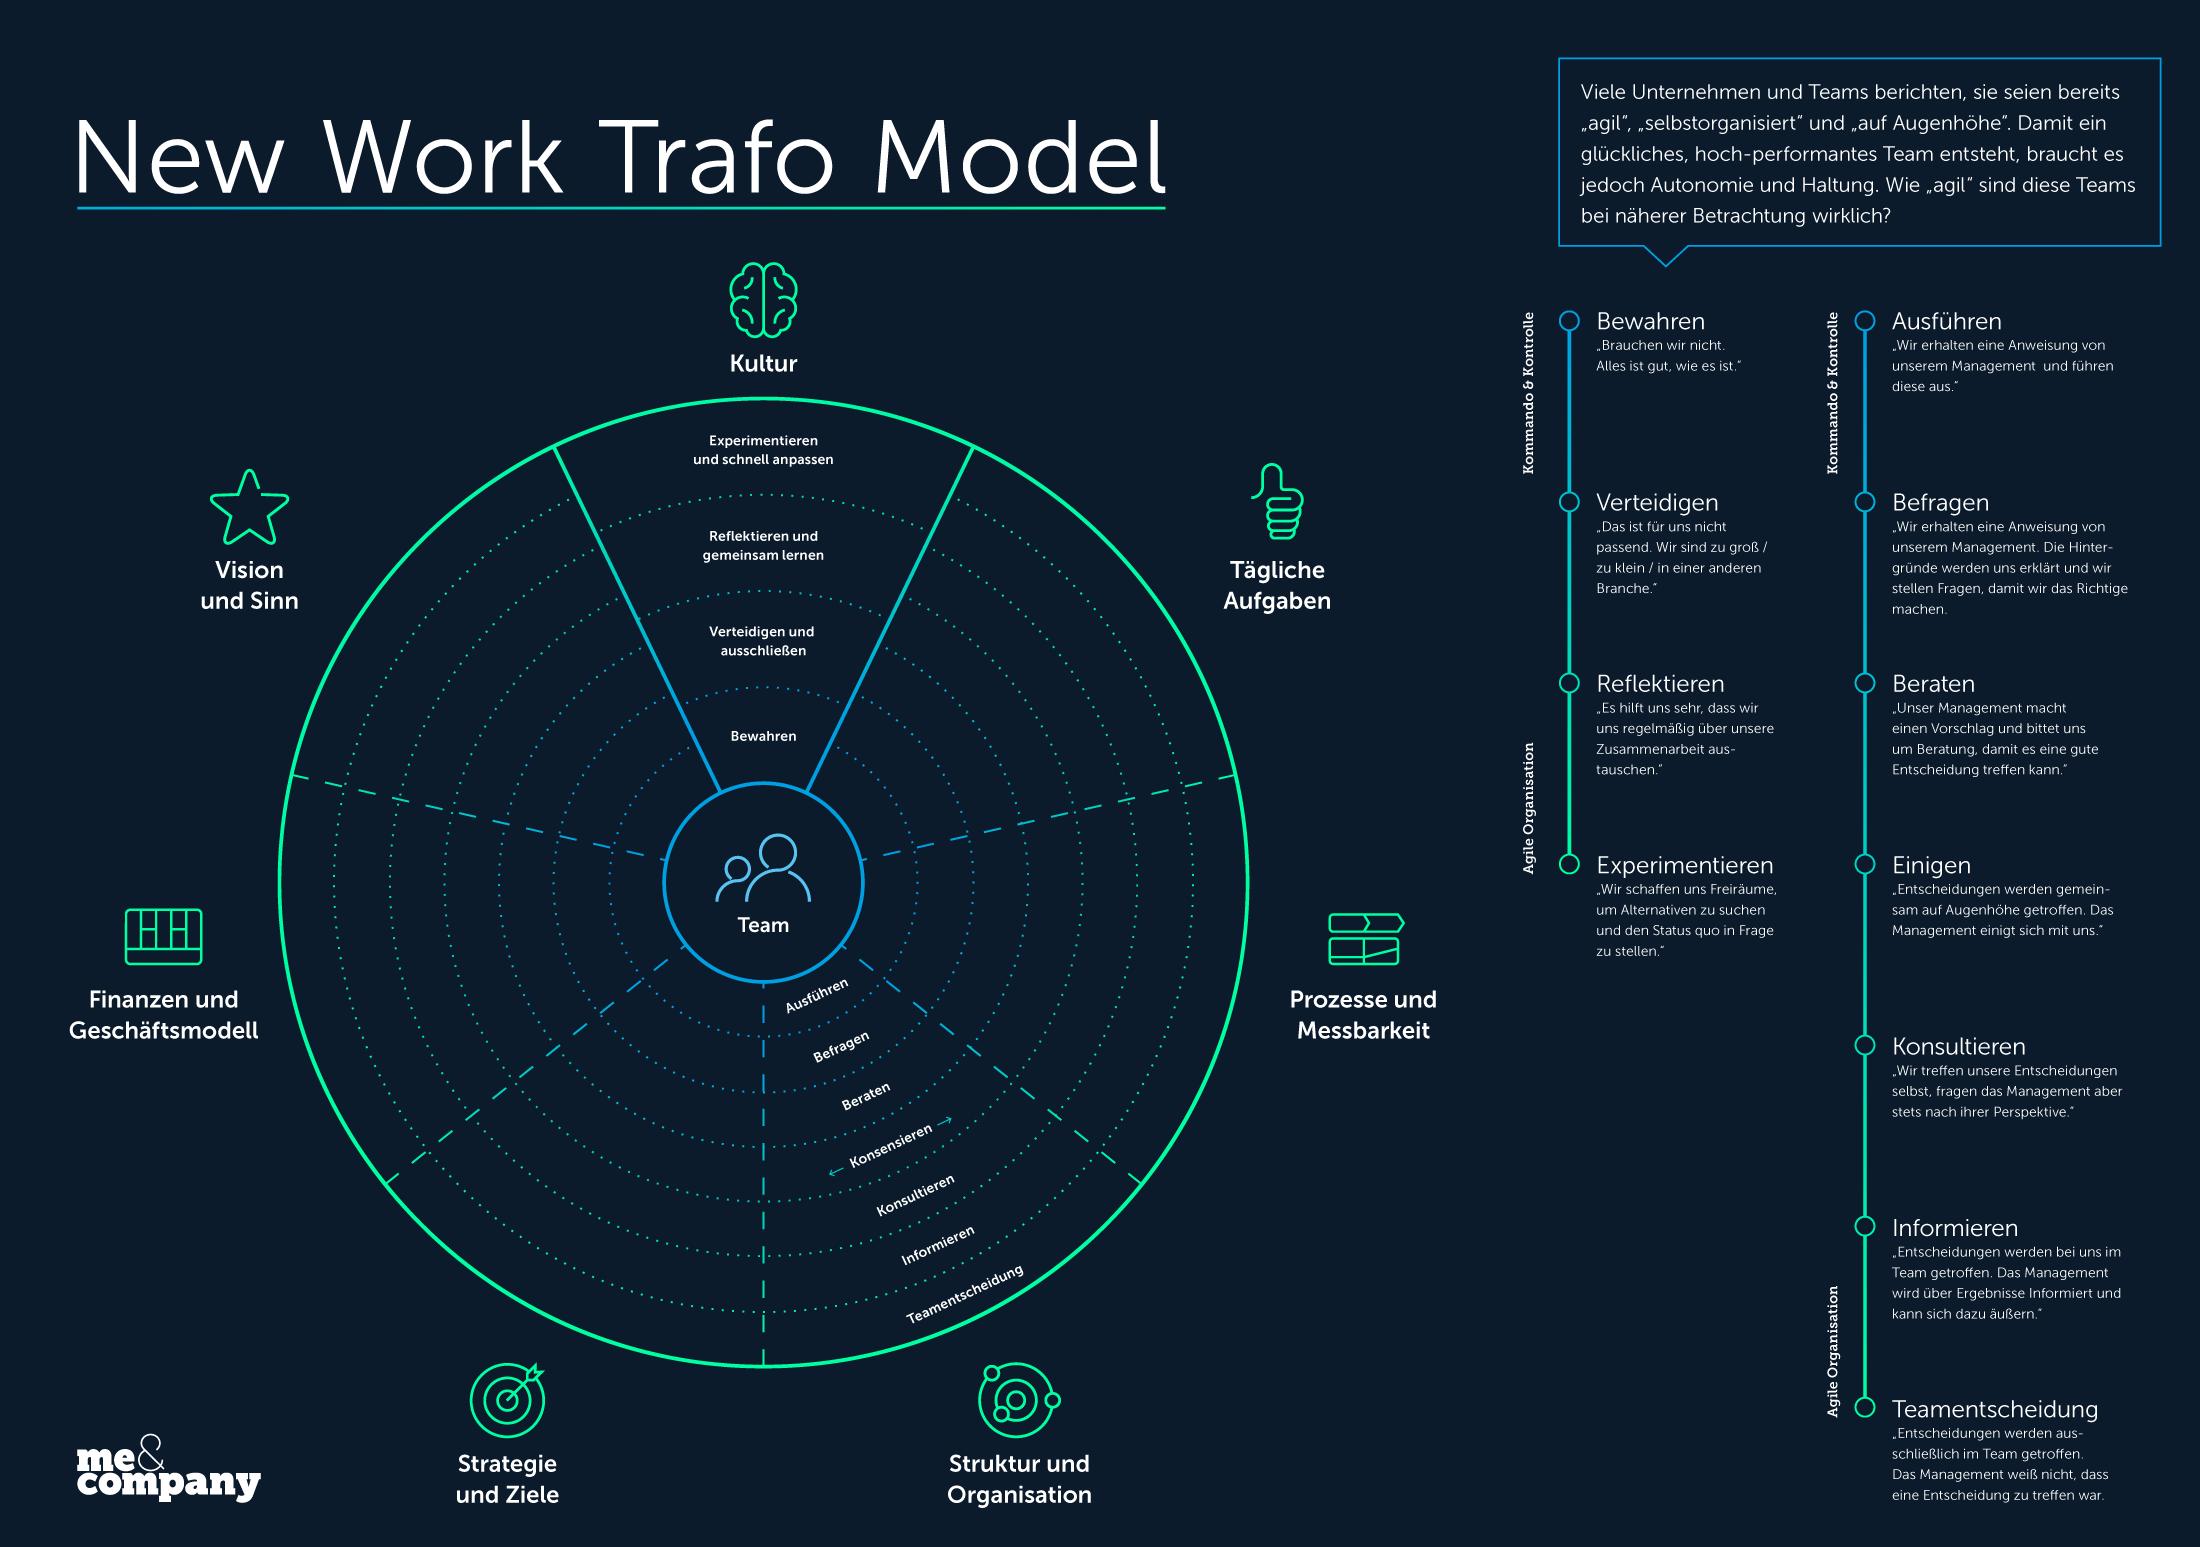 Transformationsmodell zum agilen Reifegrad von Me & Company